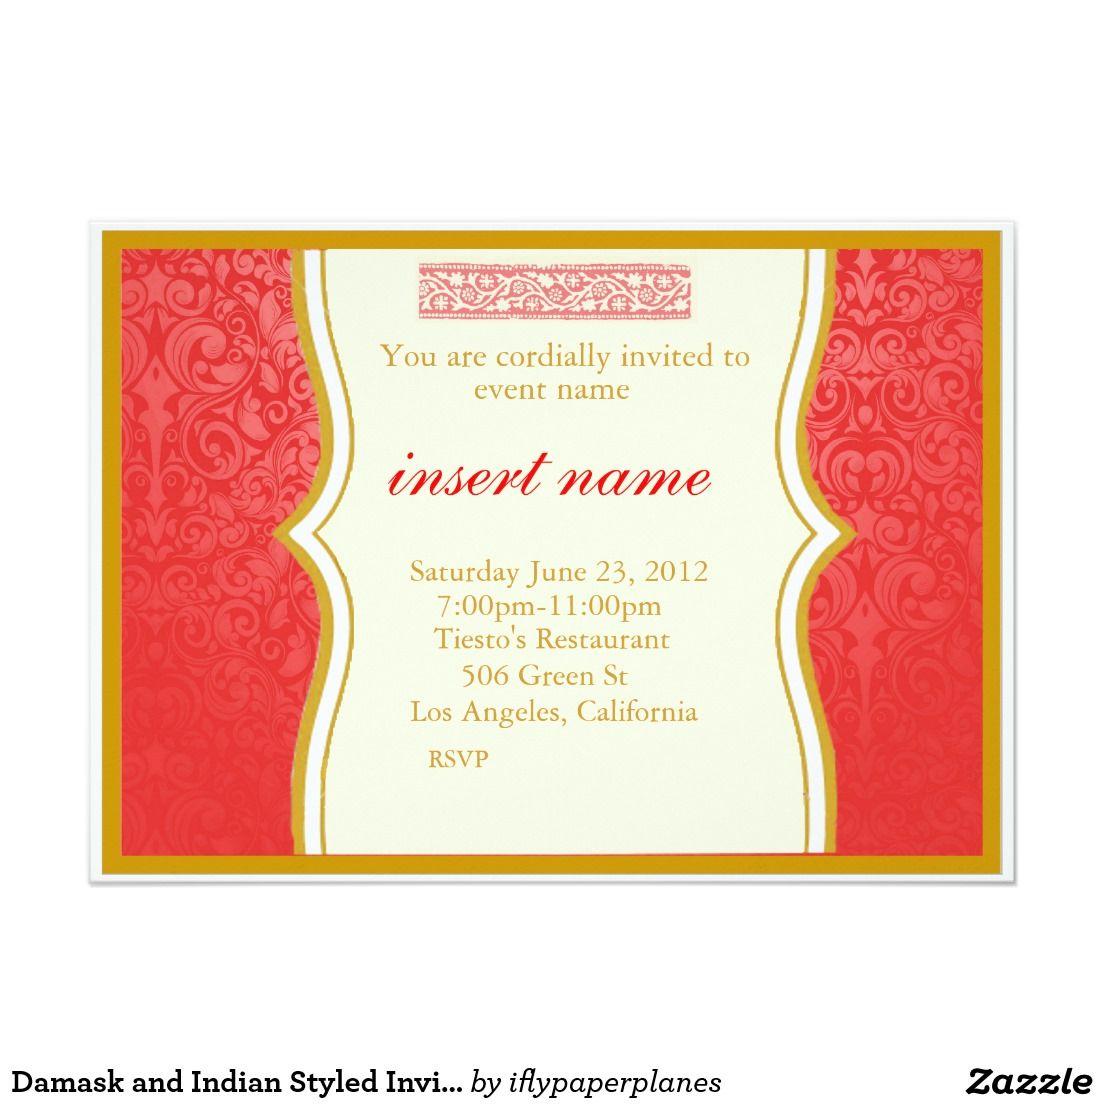 Damask and Indian Styled Invite | Wedding decor | Pinterest | Indian ...